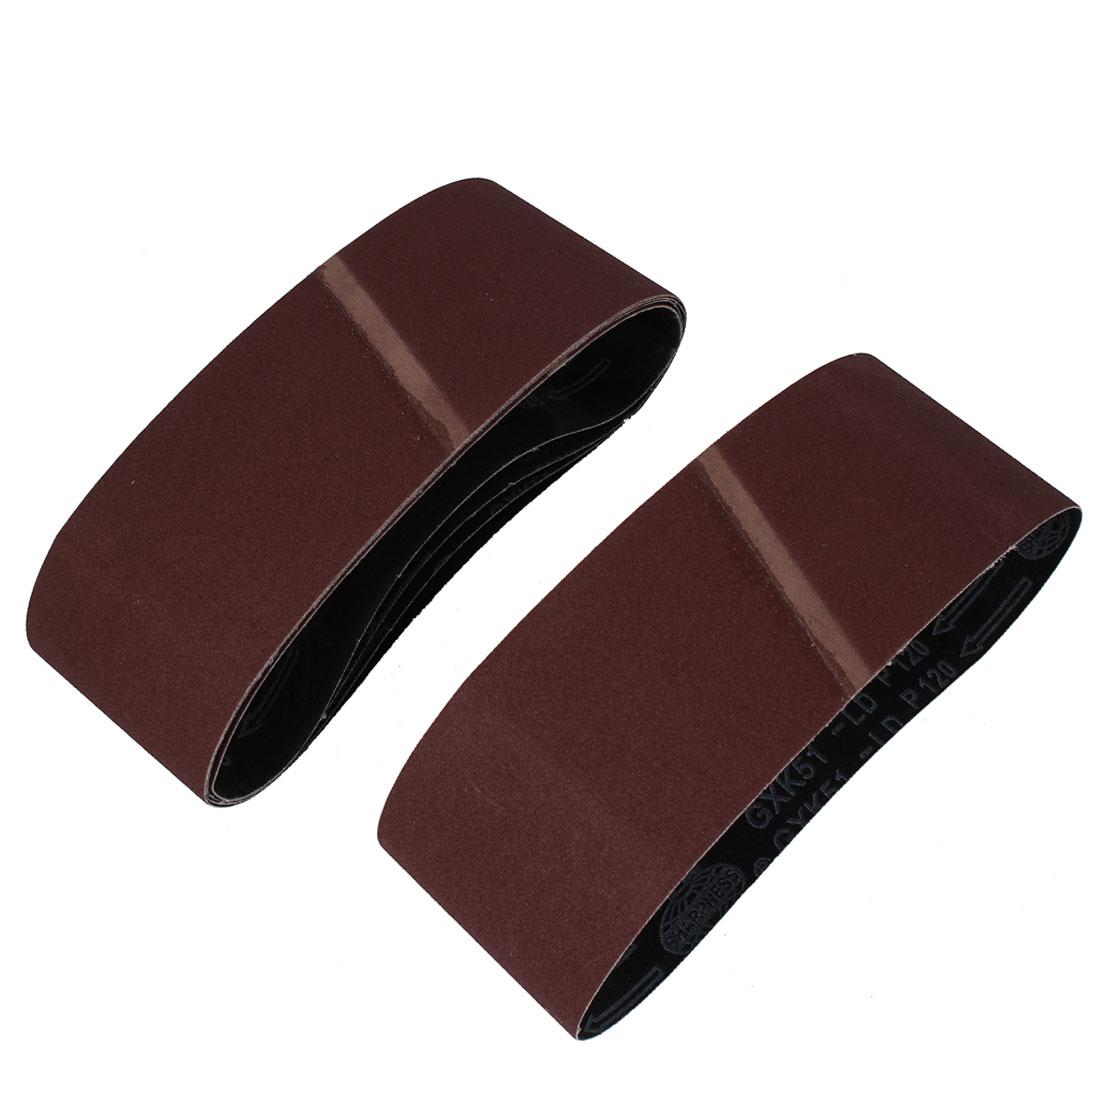 Sander Polishing Machine 610x93mm 120 Grit Abrasive Sanding Belt Sandpaper 5pcs